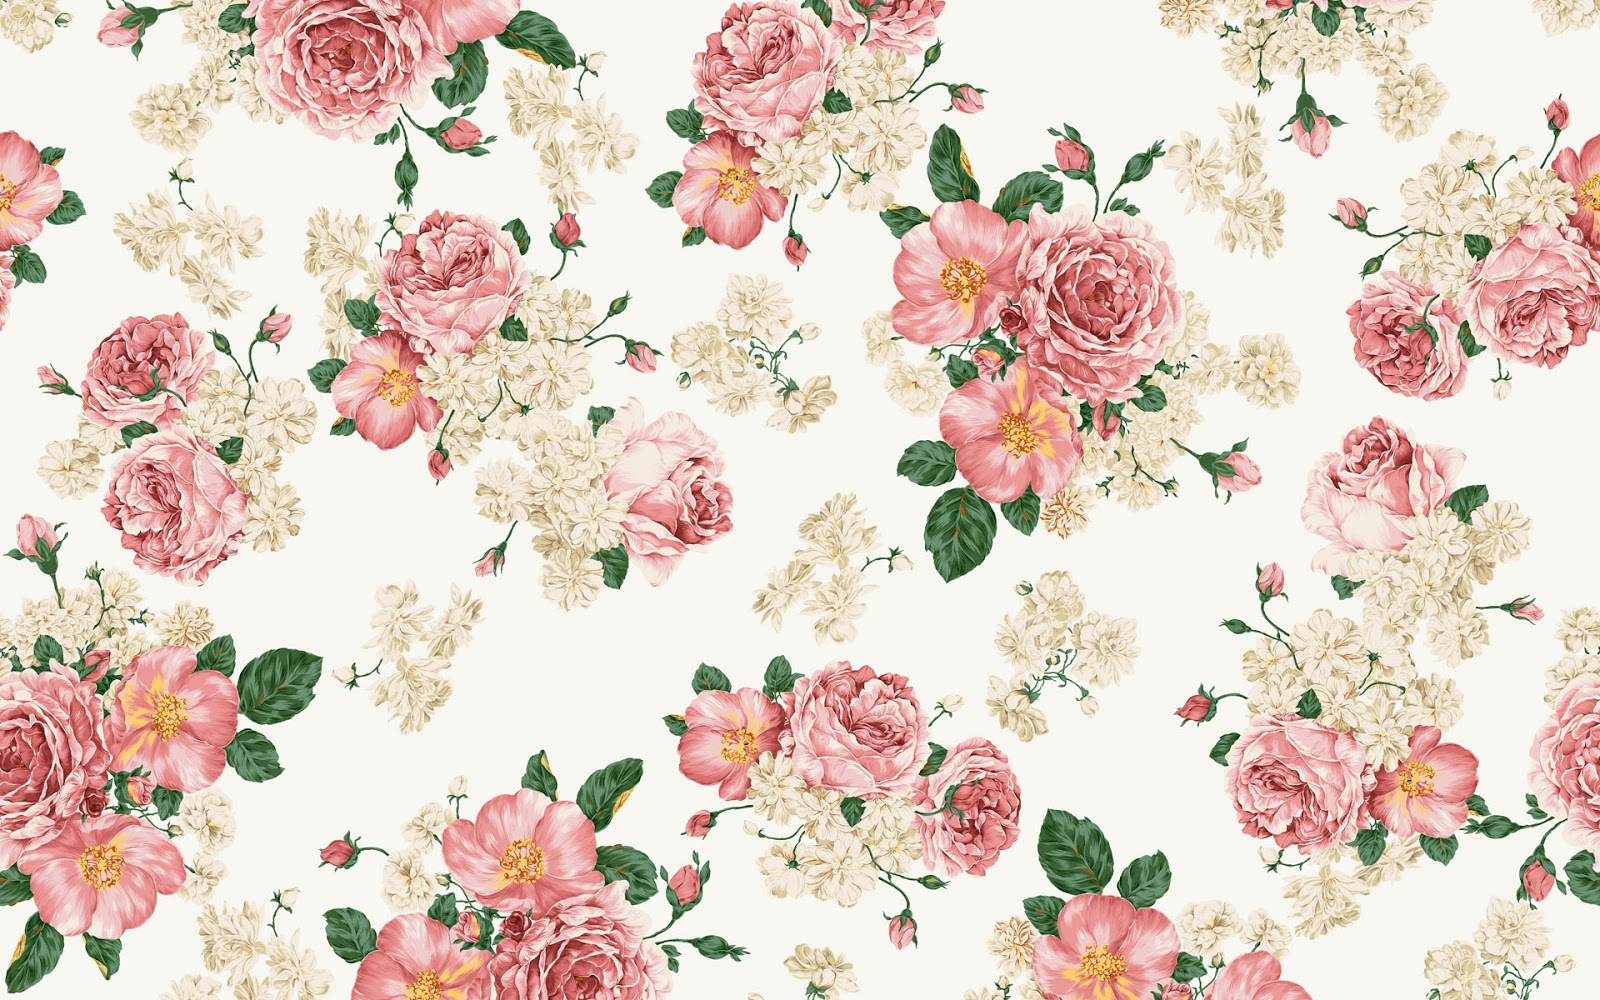 46 Vintage Floral Wallpapers On Wallpapersafari